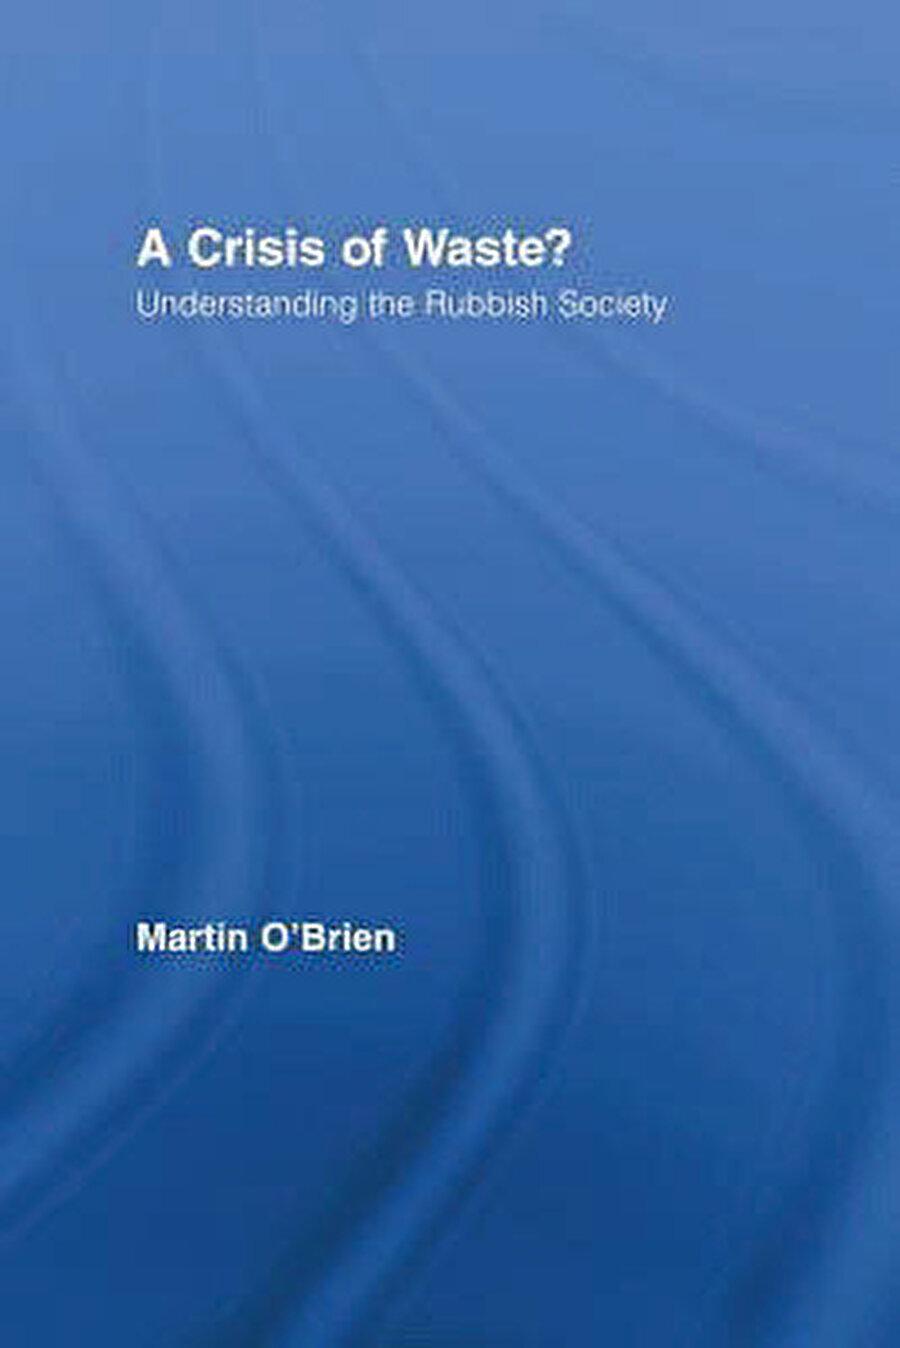 Martin O'Brien, The Crisis of Waste?